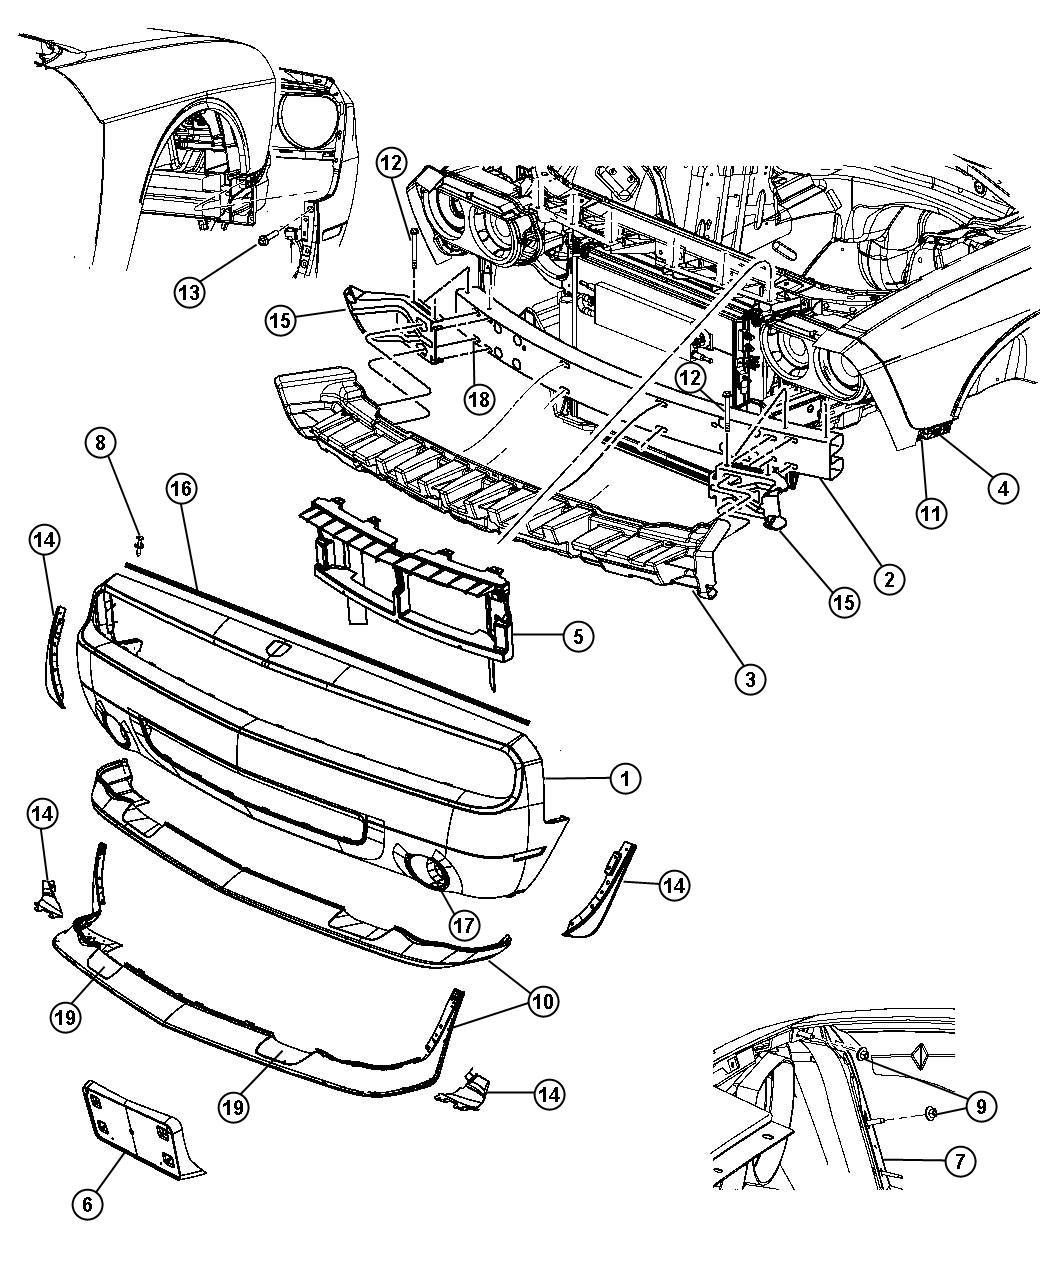 Honda Crosstour Electrical Diagram